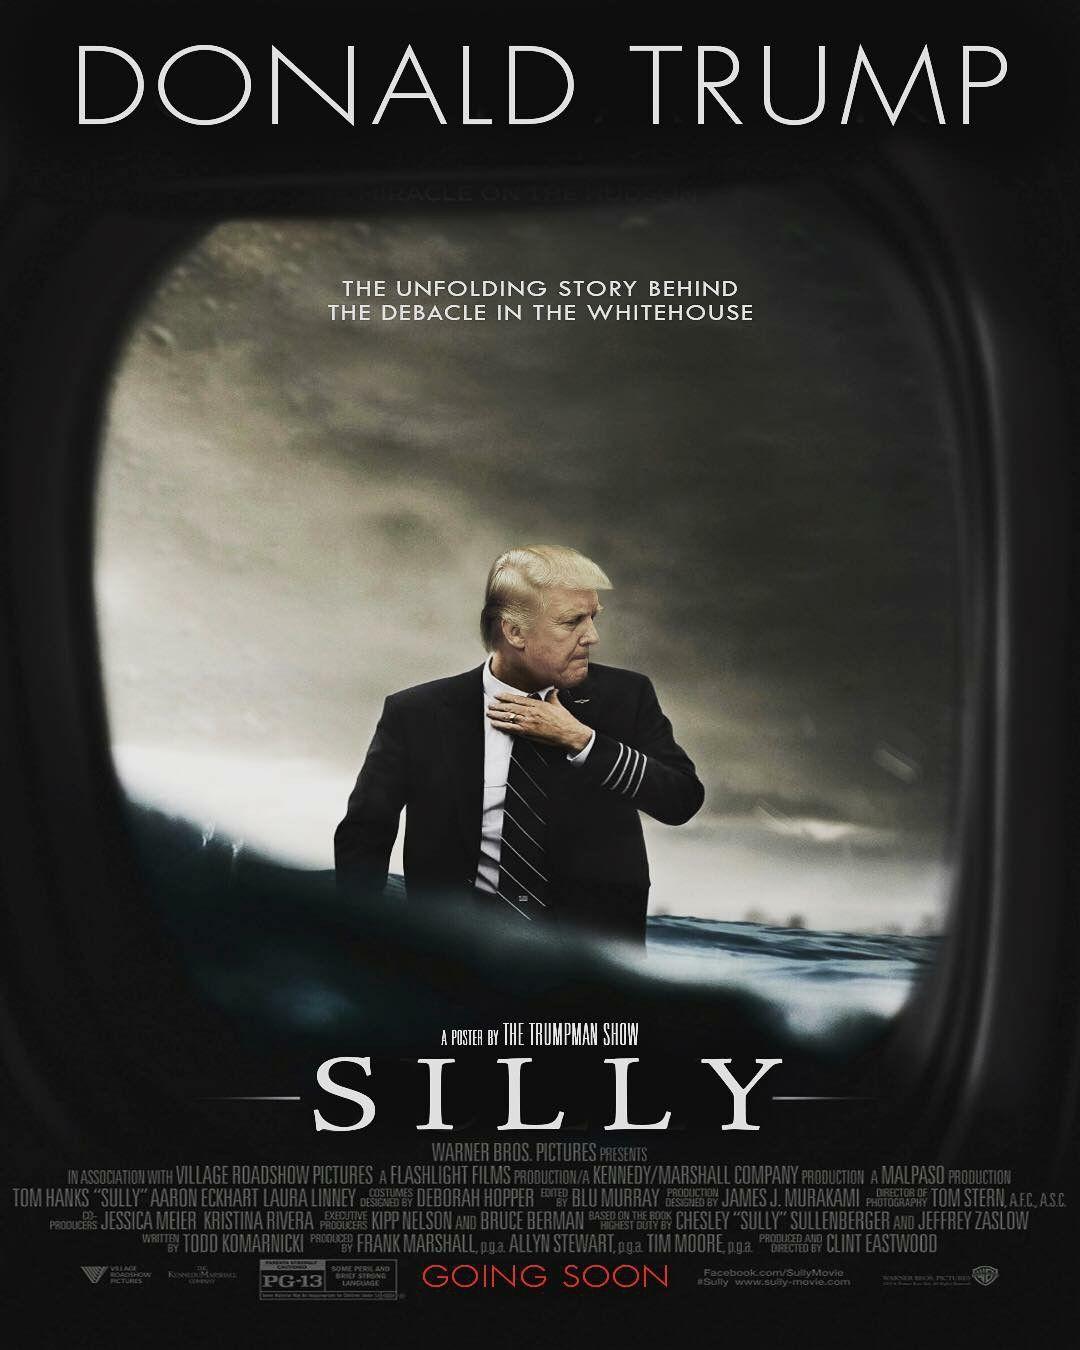 Pin by Sherri O'Regan on Trump Presidential humor Tom